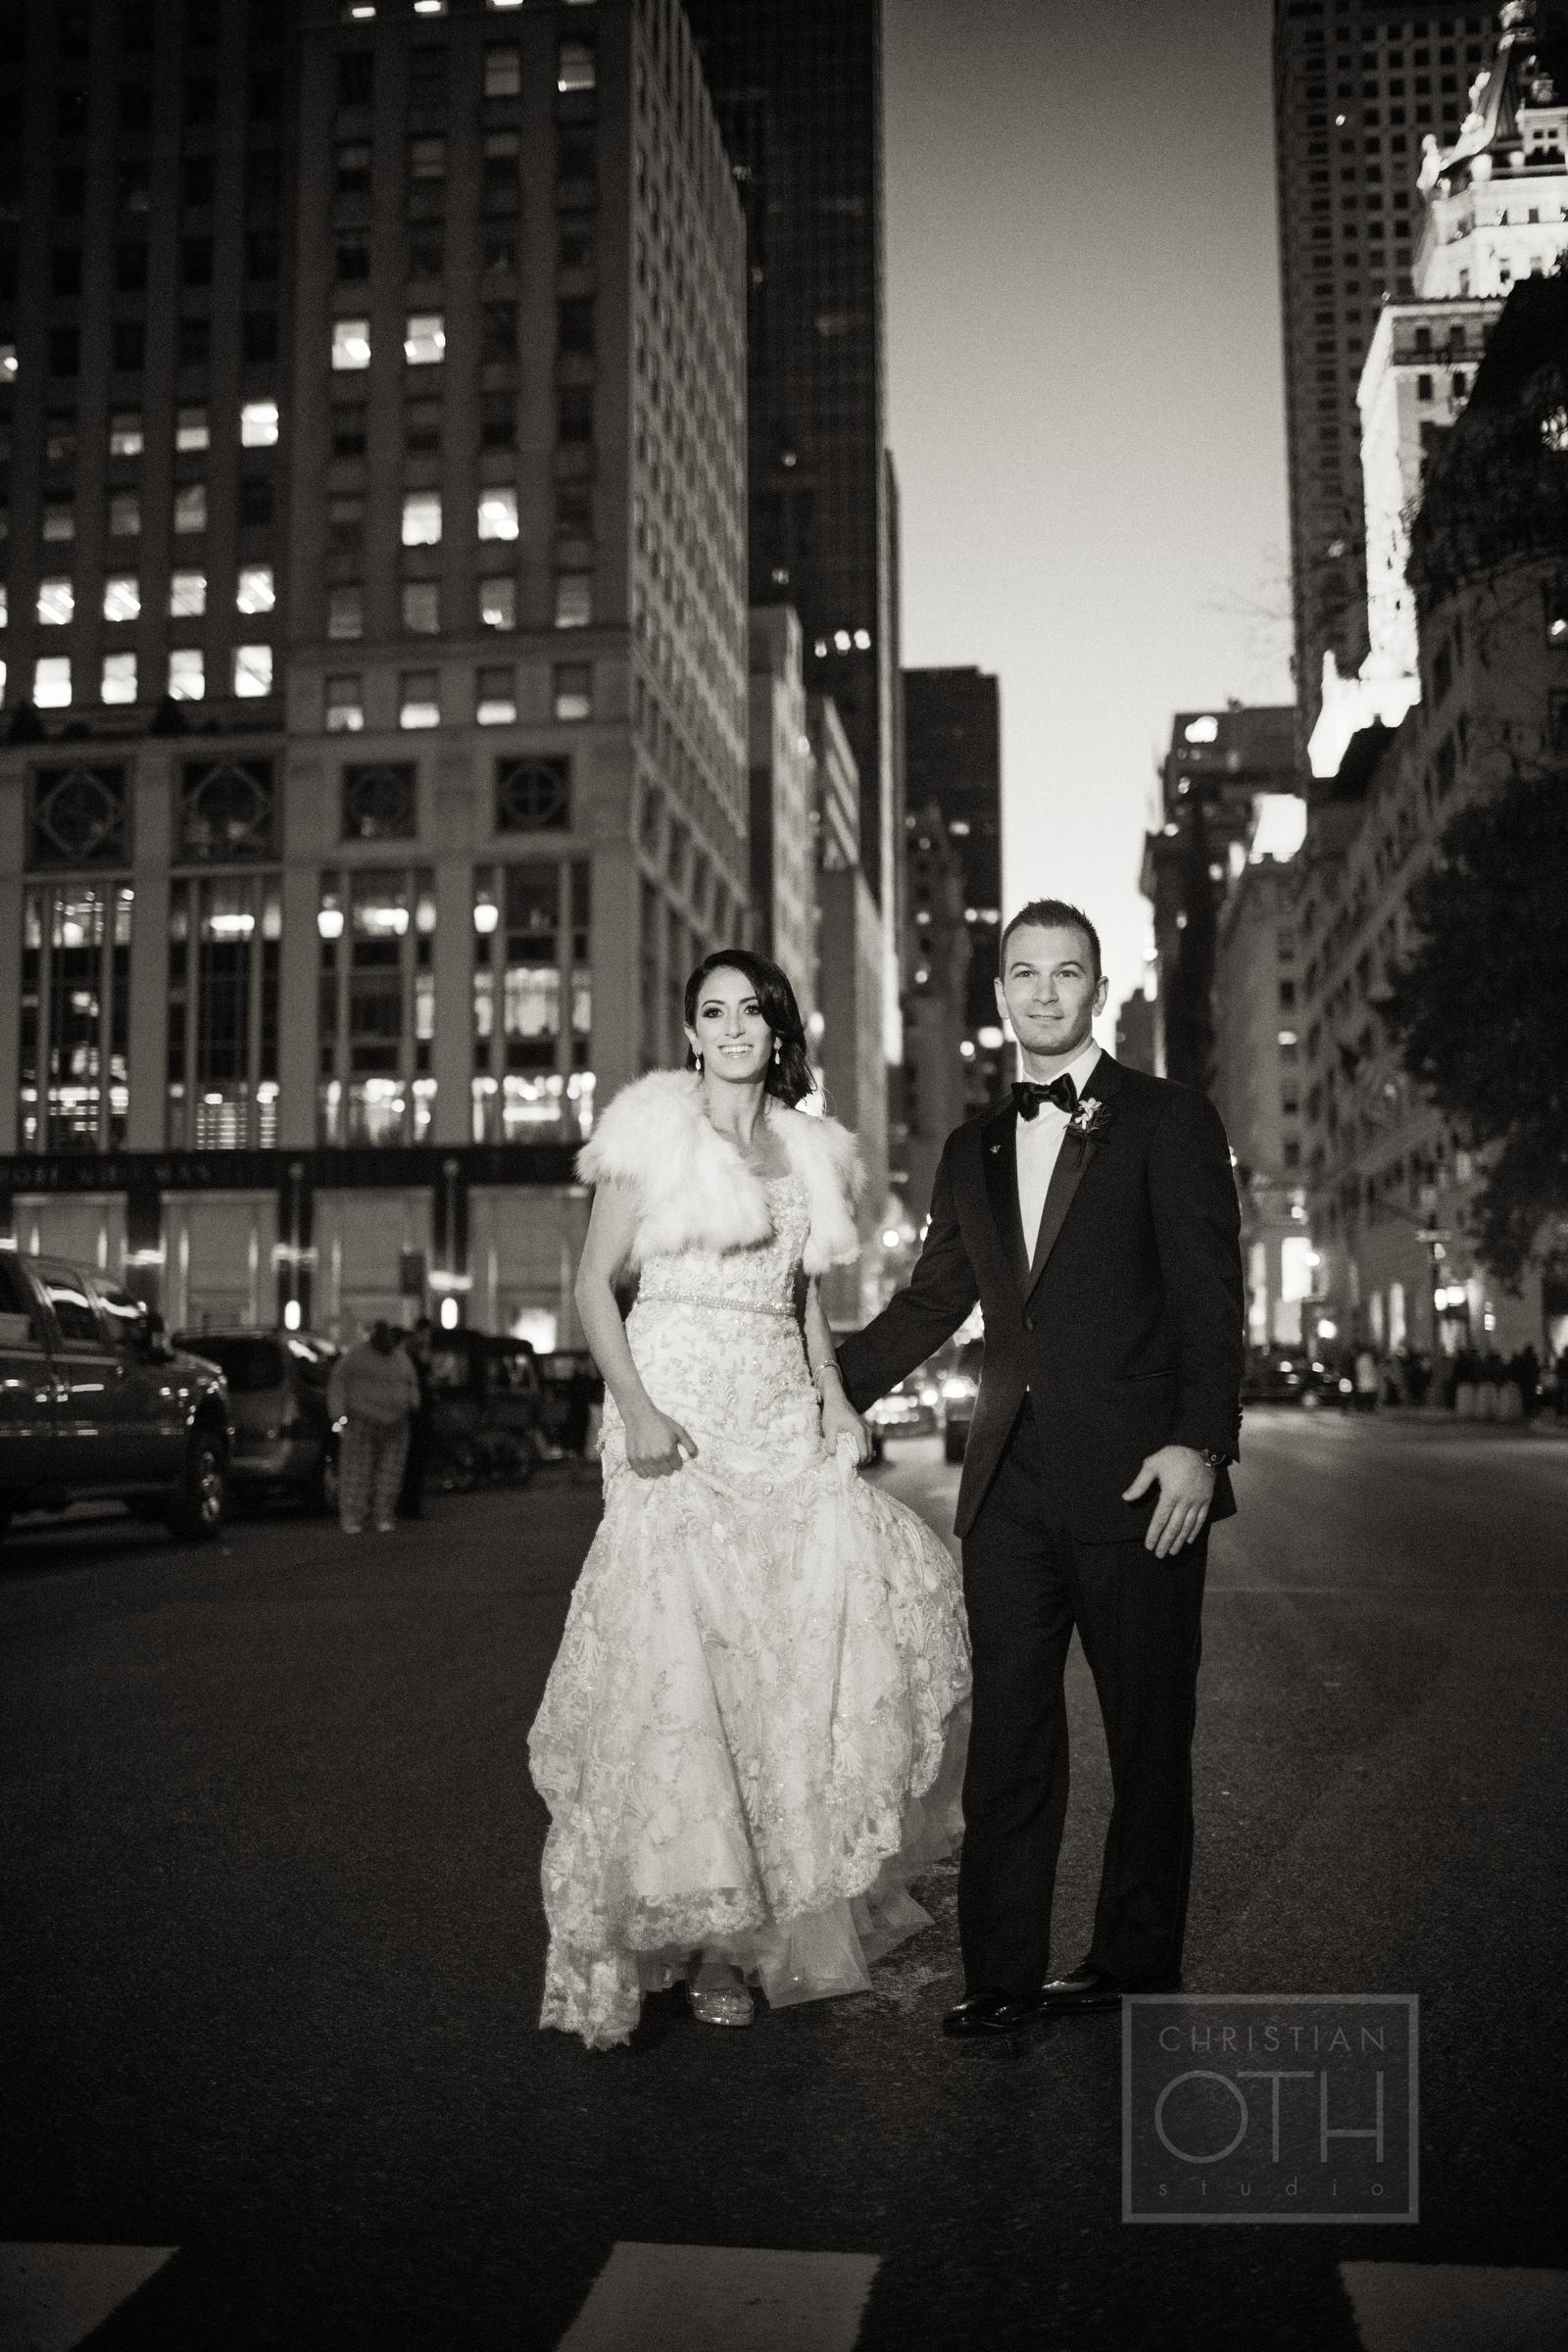 Ceci_New_York_Custom_Invitation_Pierre__City_ Destination_Wedding_Luxury_Personalized_Ceci_Style_Bride_Rose_Gold_Foil_Stamping78.JPG